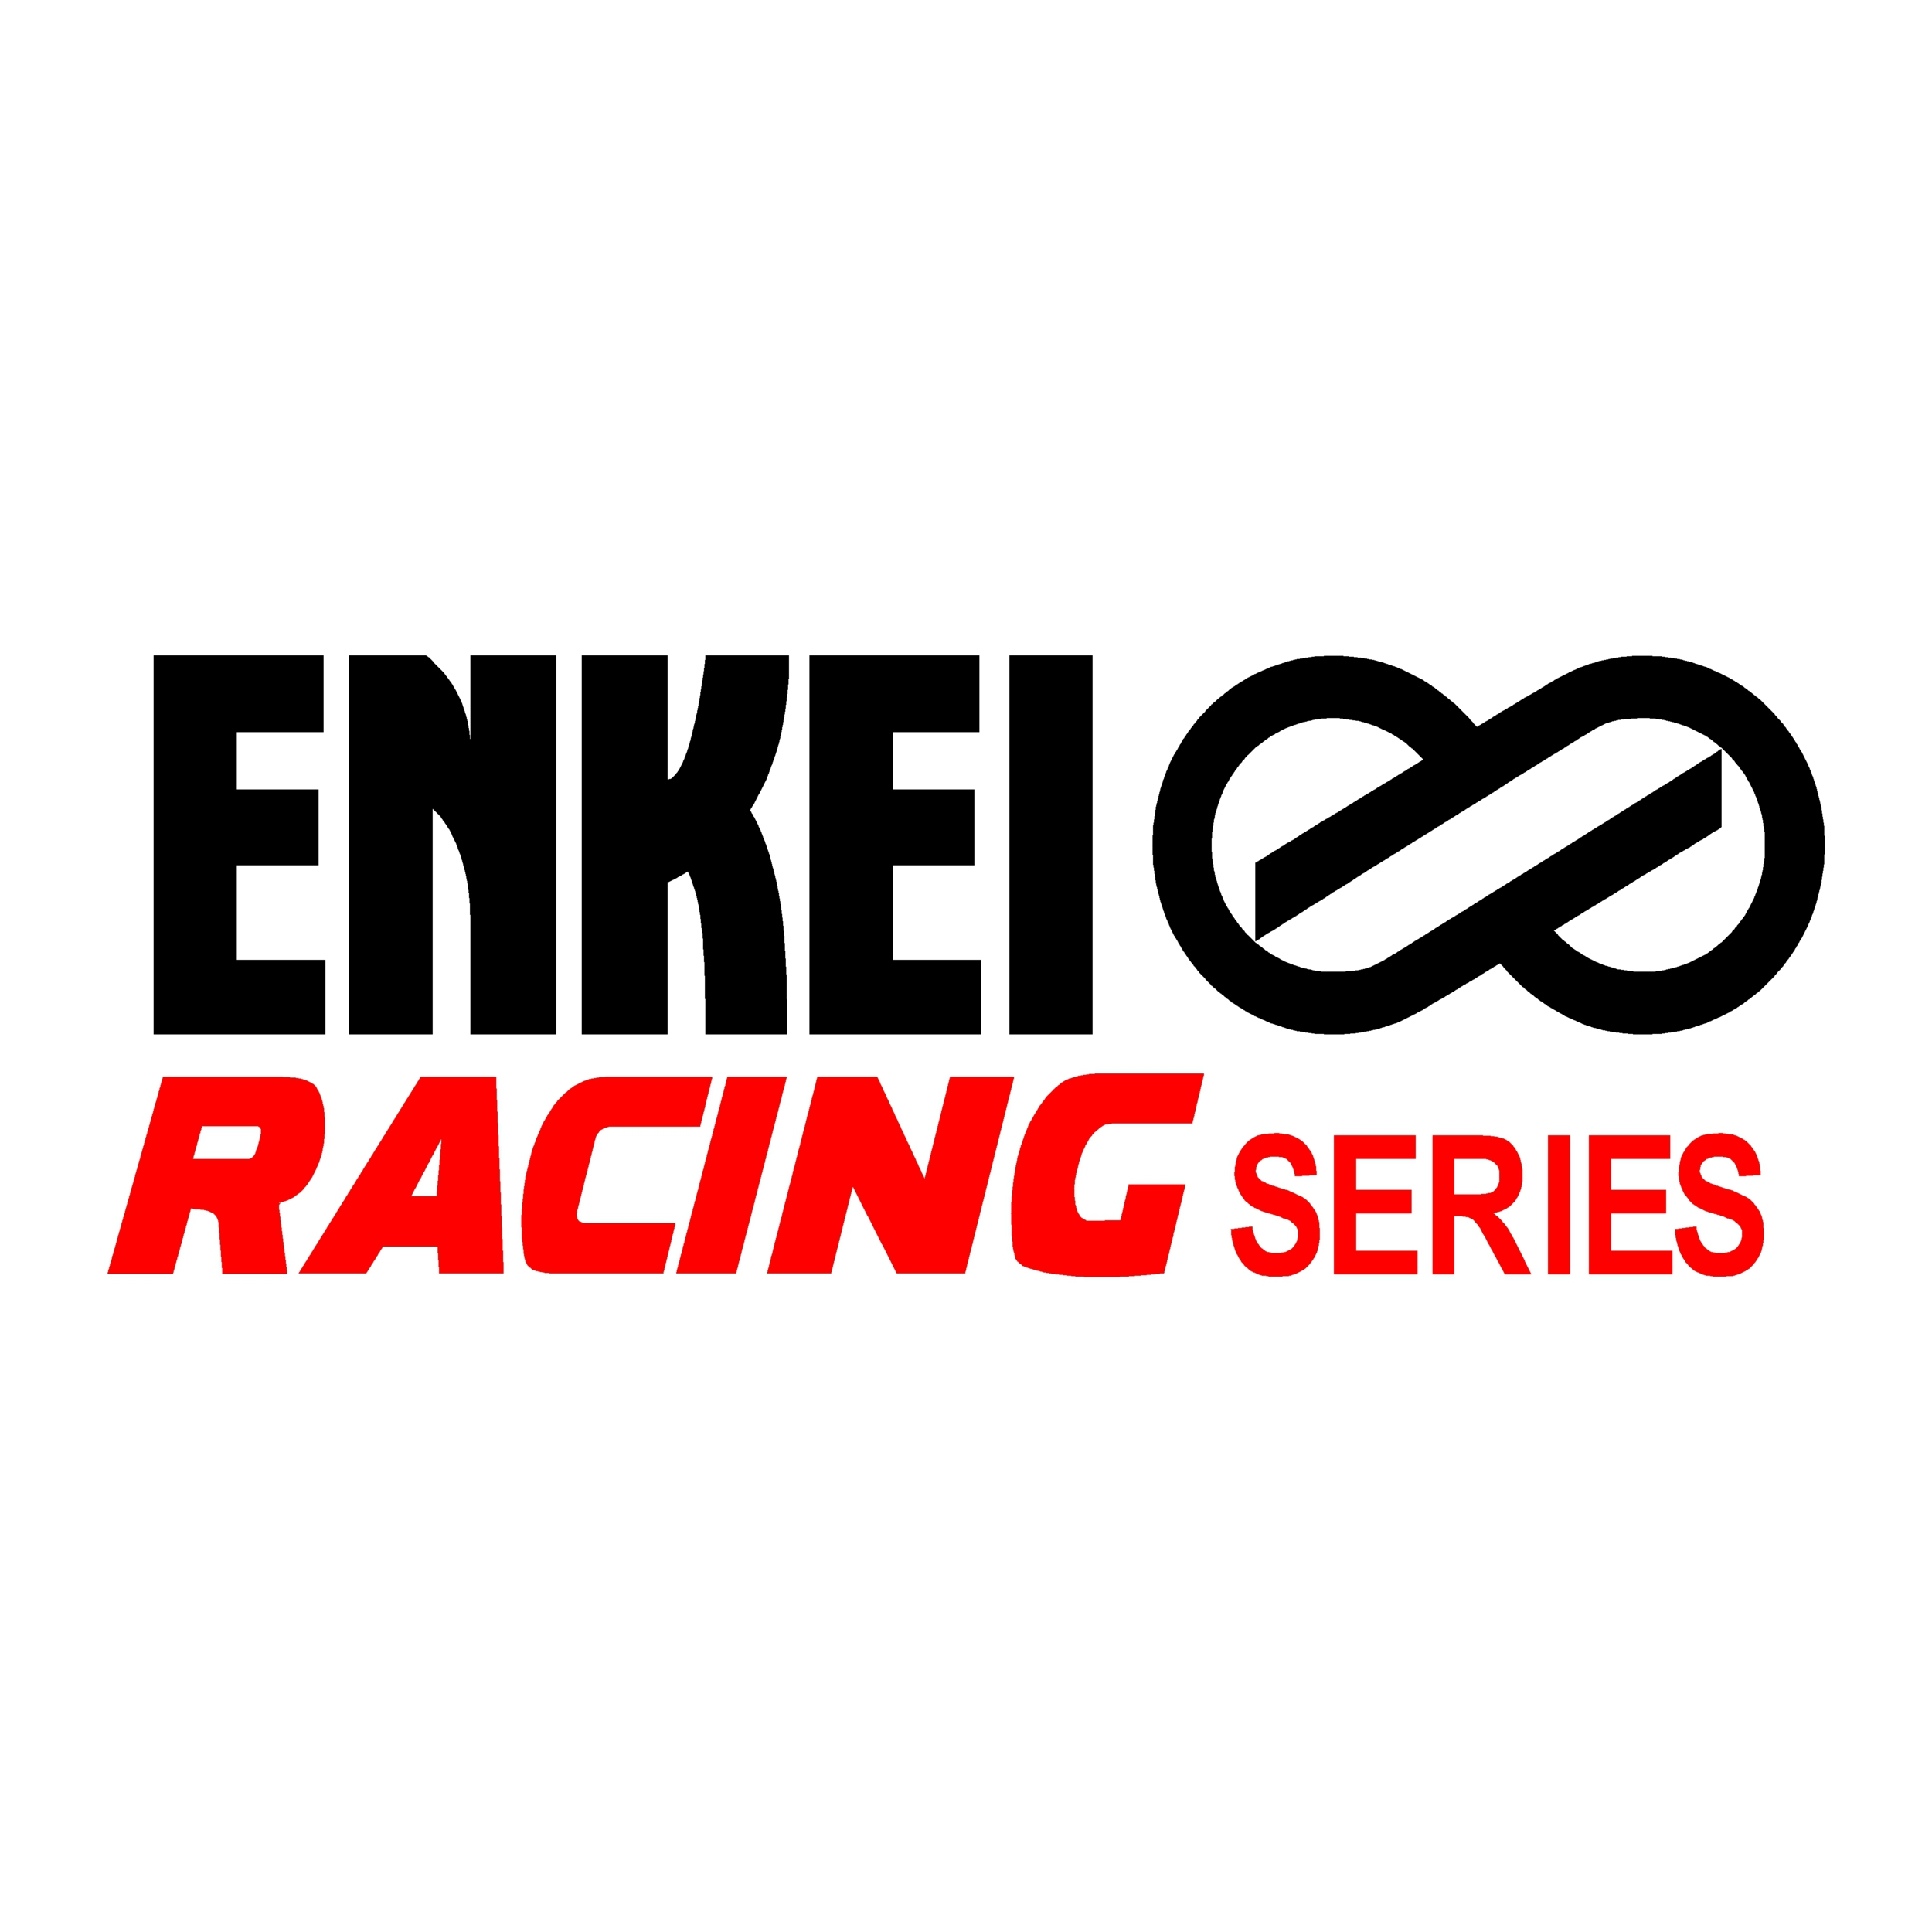 stickers enkei ref 3 tuning audio sonorisation car auto moto camion competition deco rallye autocollant